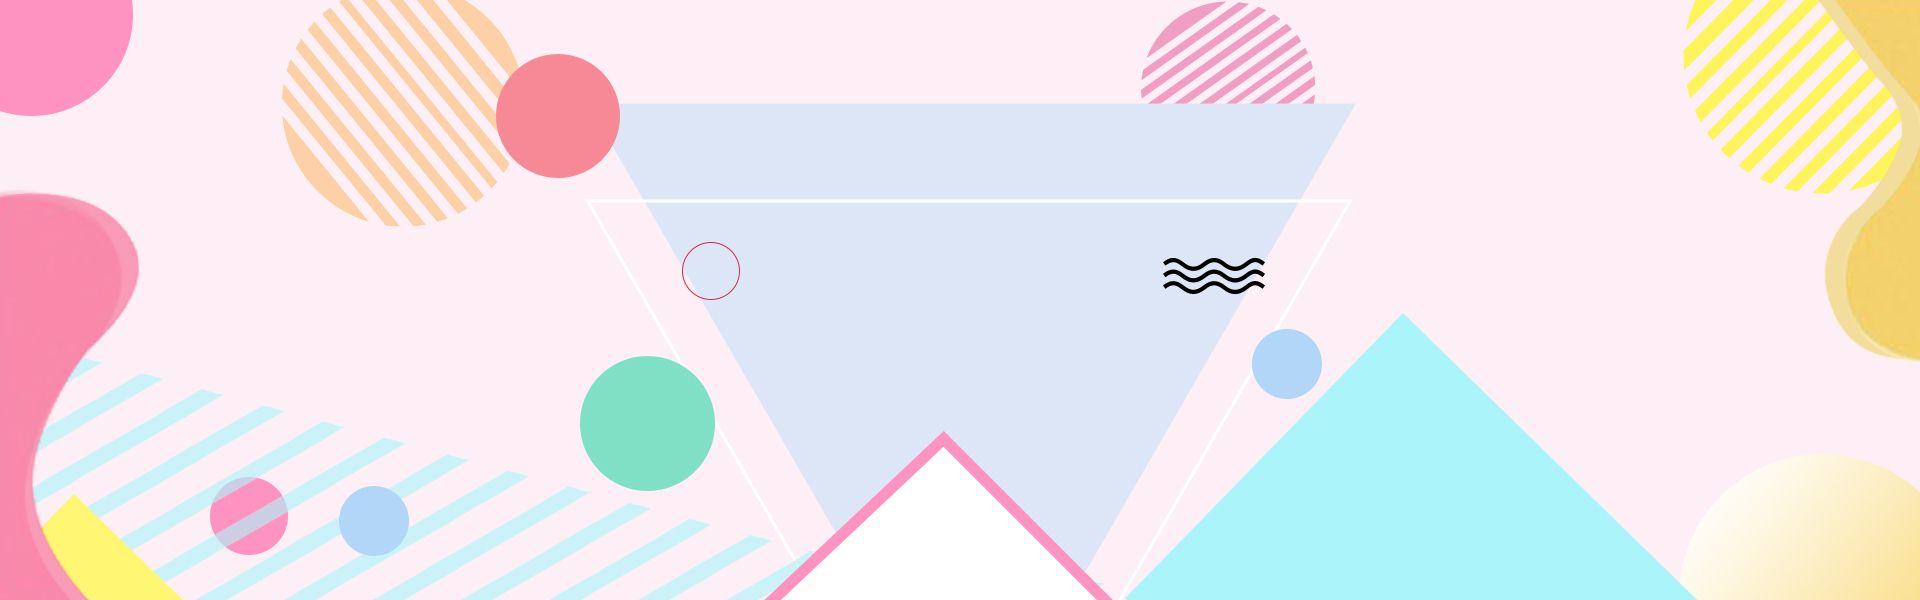 Pink Sweet Female Supplies Cosmetics Banner Background Youtube Banner Backgrounds Cosmetics Banner Banner Background Images